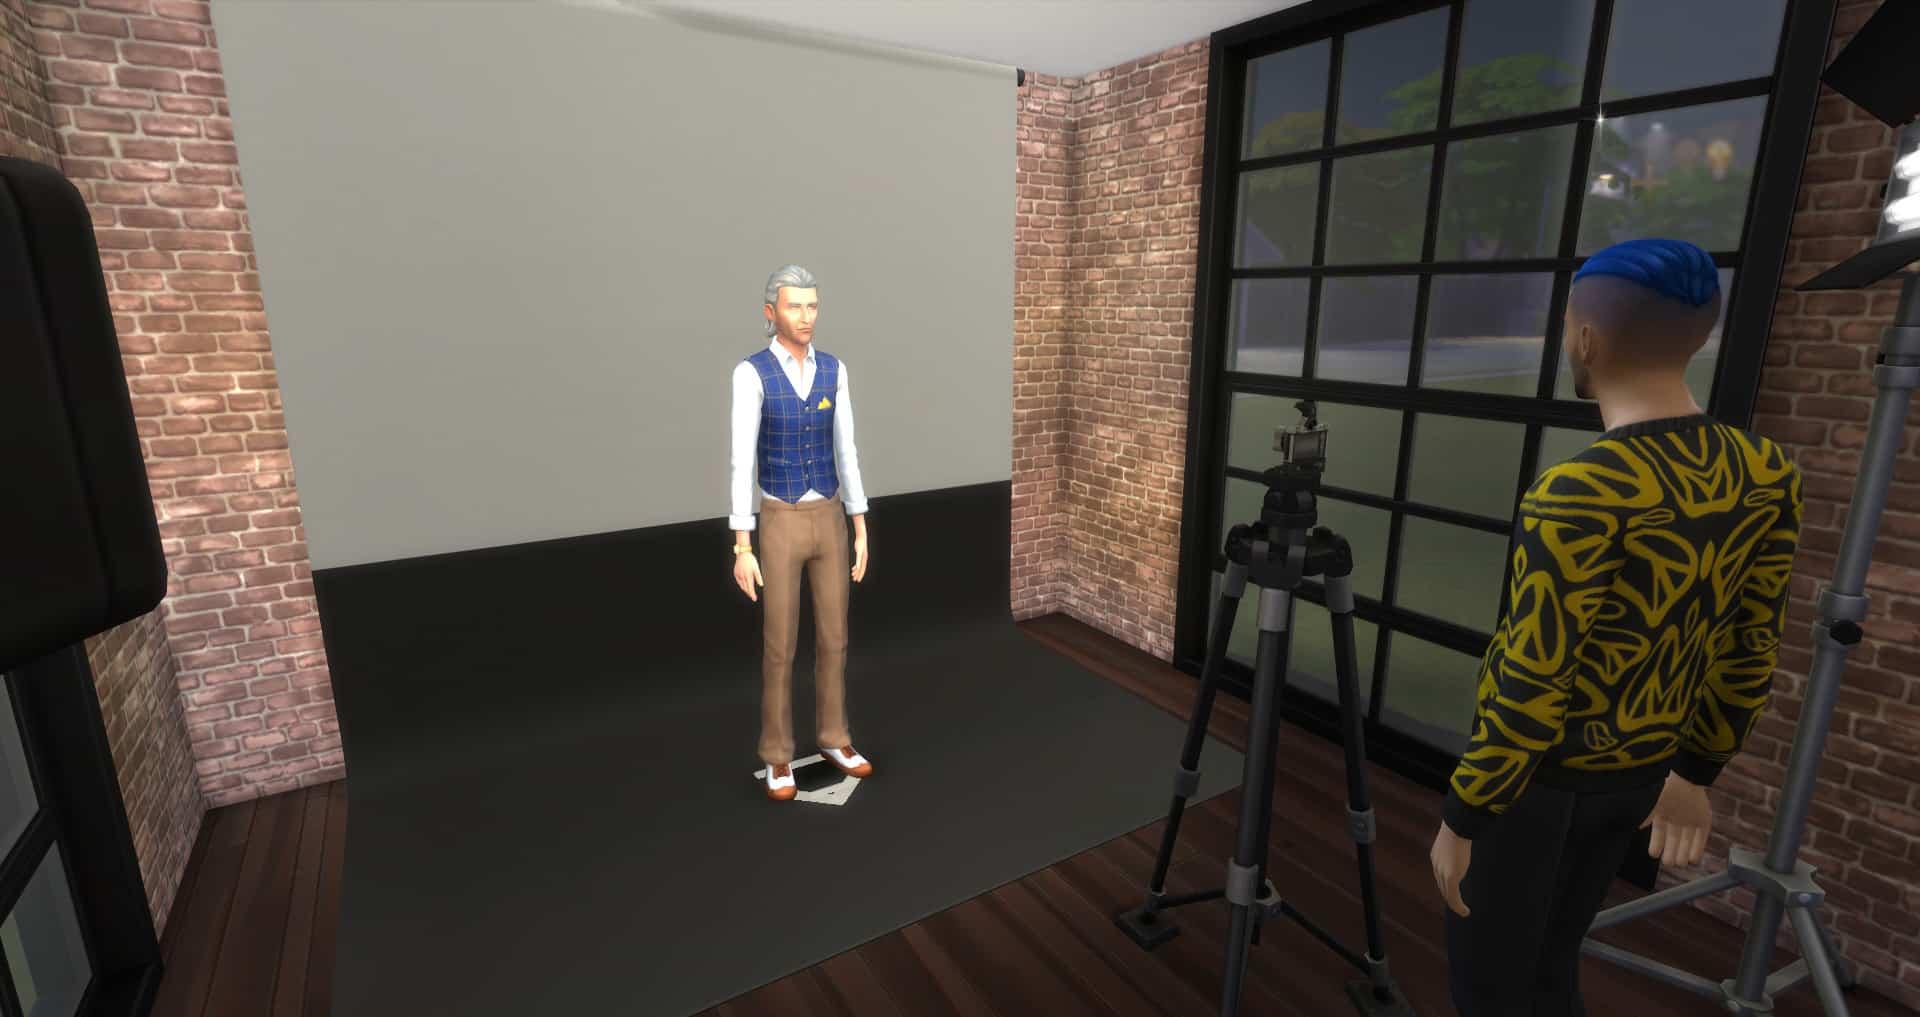 The Sims 4 Moschino Stuff Creating A Photo Studio